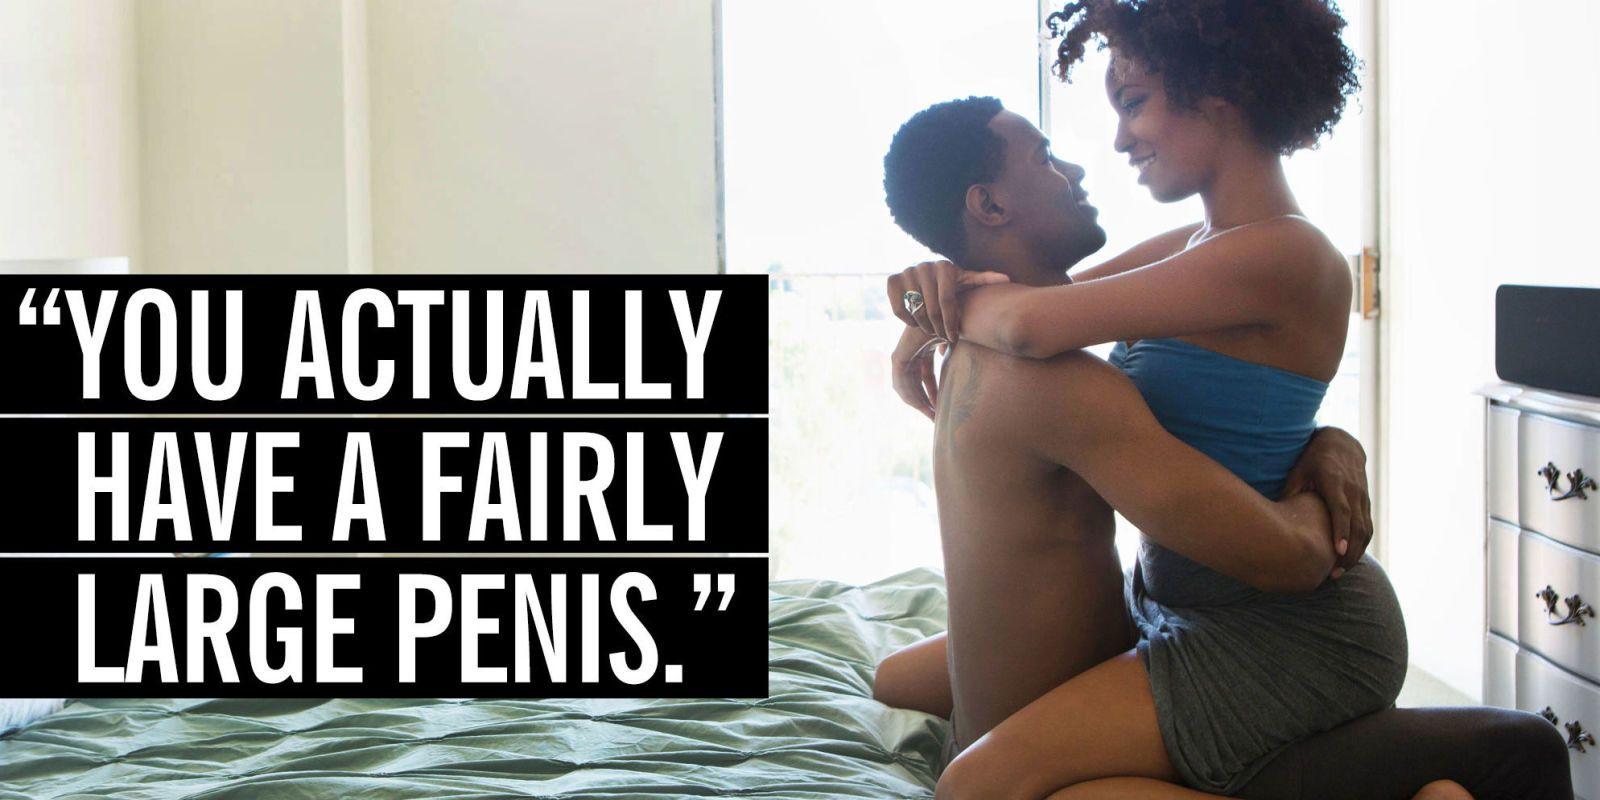 Hot talk during sex